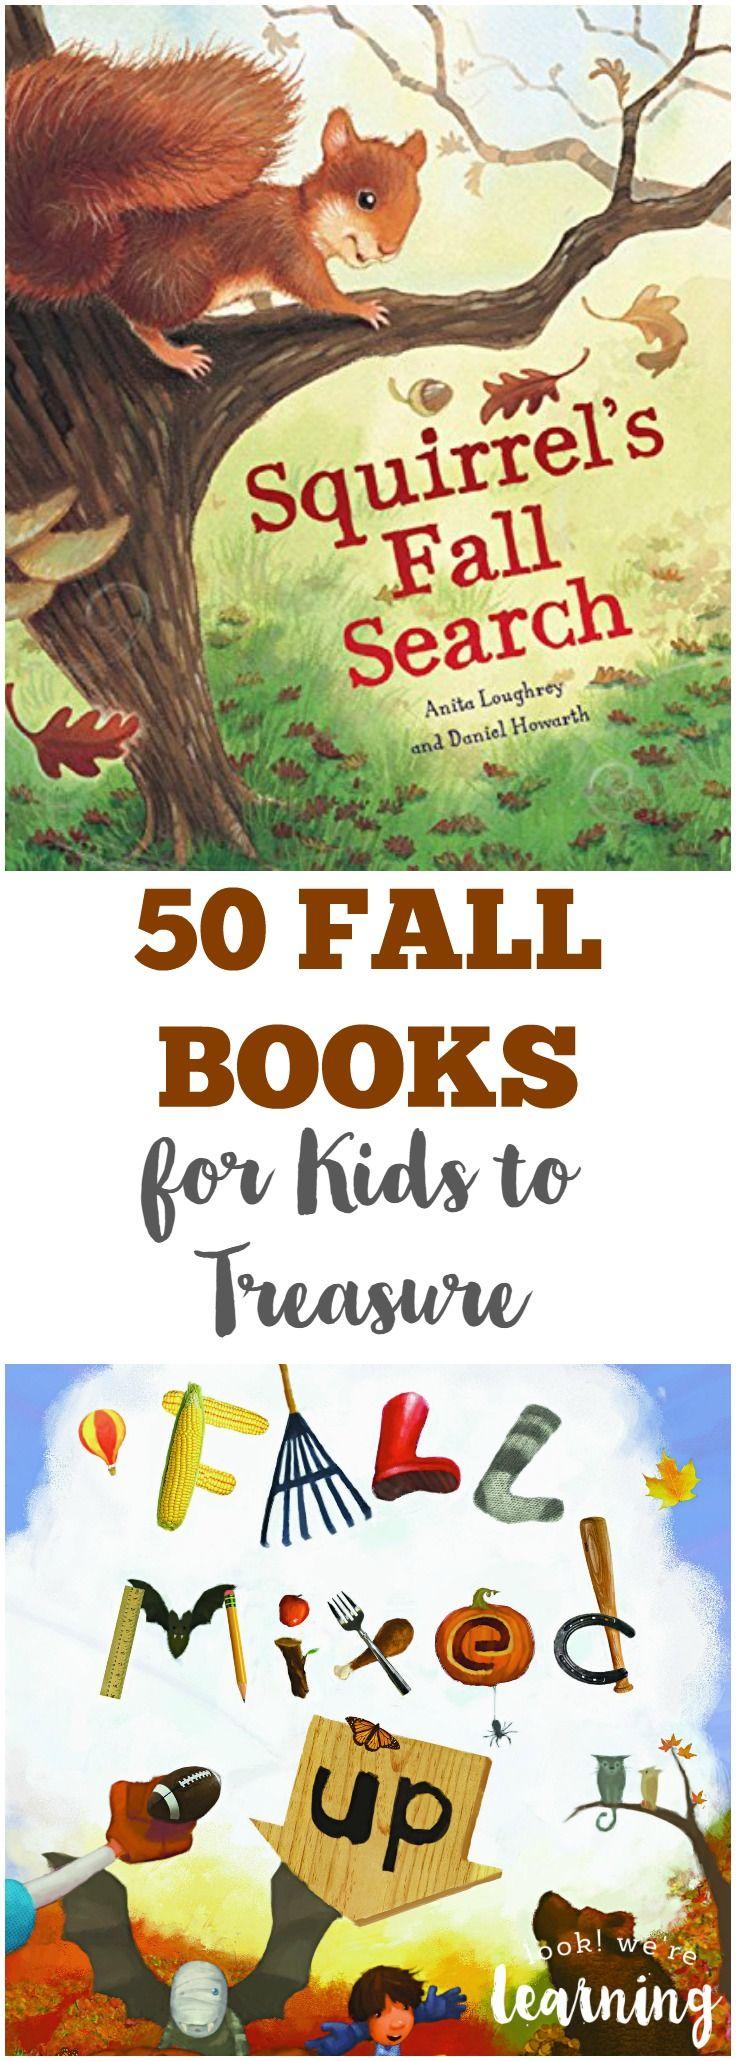 50 Fall Books for Kids